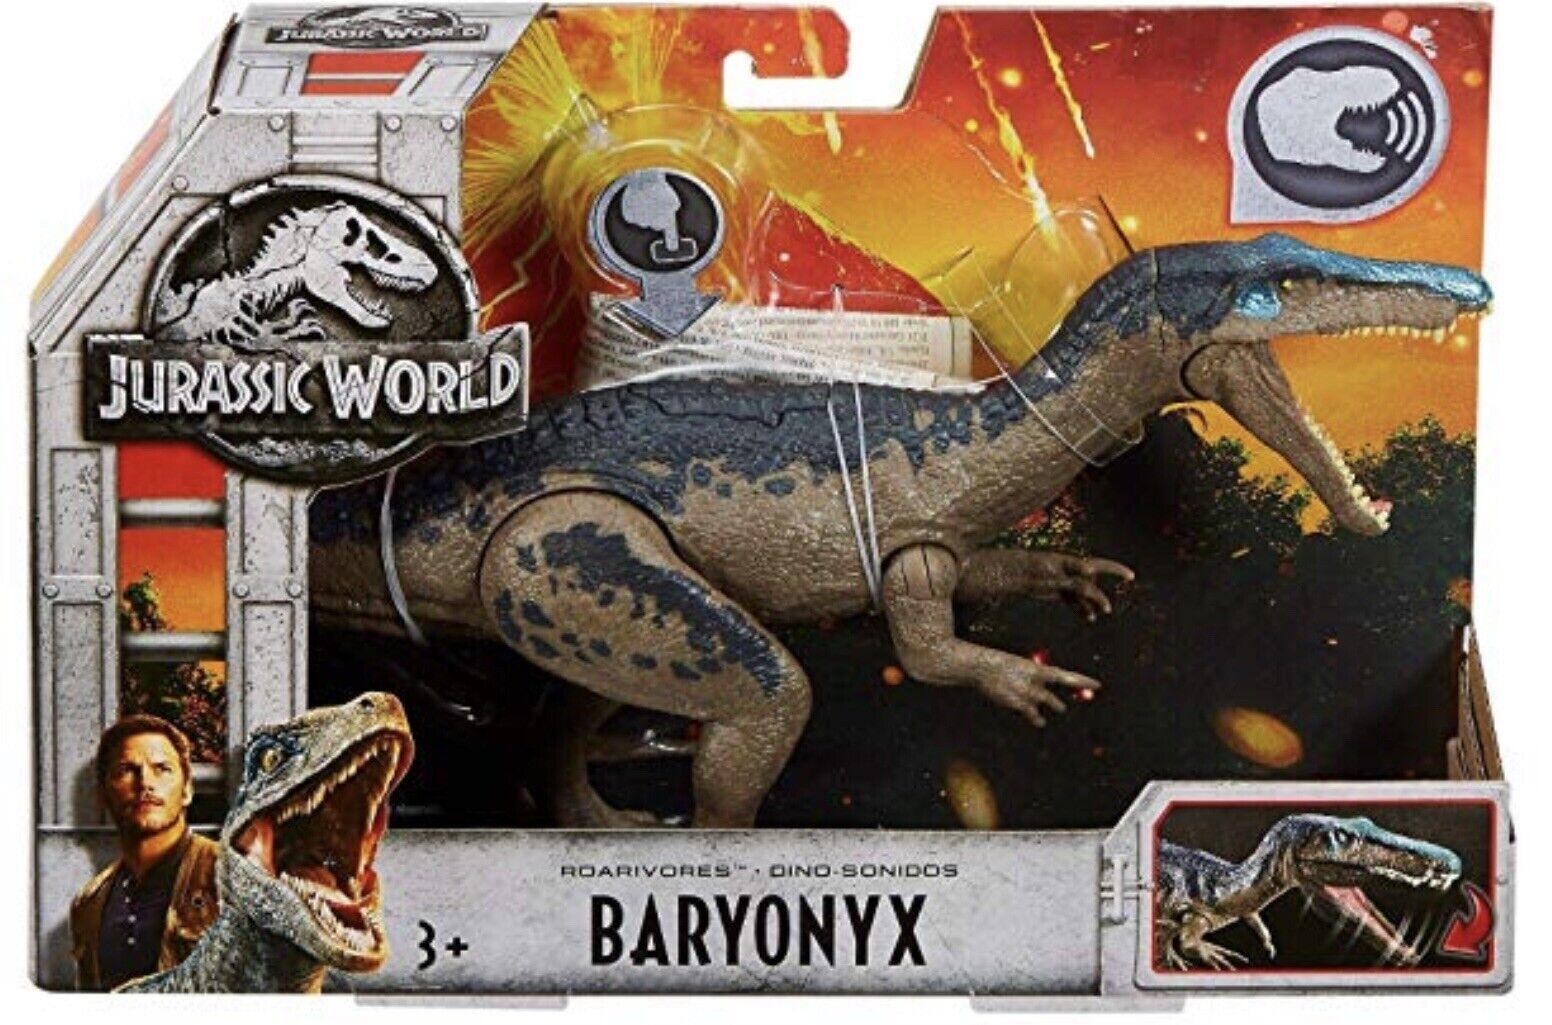 Jurassic World 2 Fallen Kingdom Kingdom Kingdom BARYONYX Roarivores Dinosaur Boy Gift bluee Shiny 8d19e3